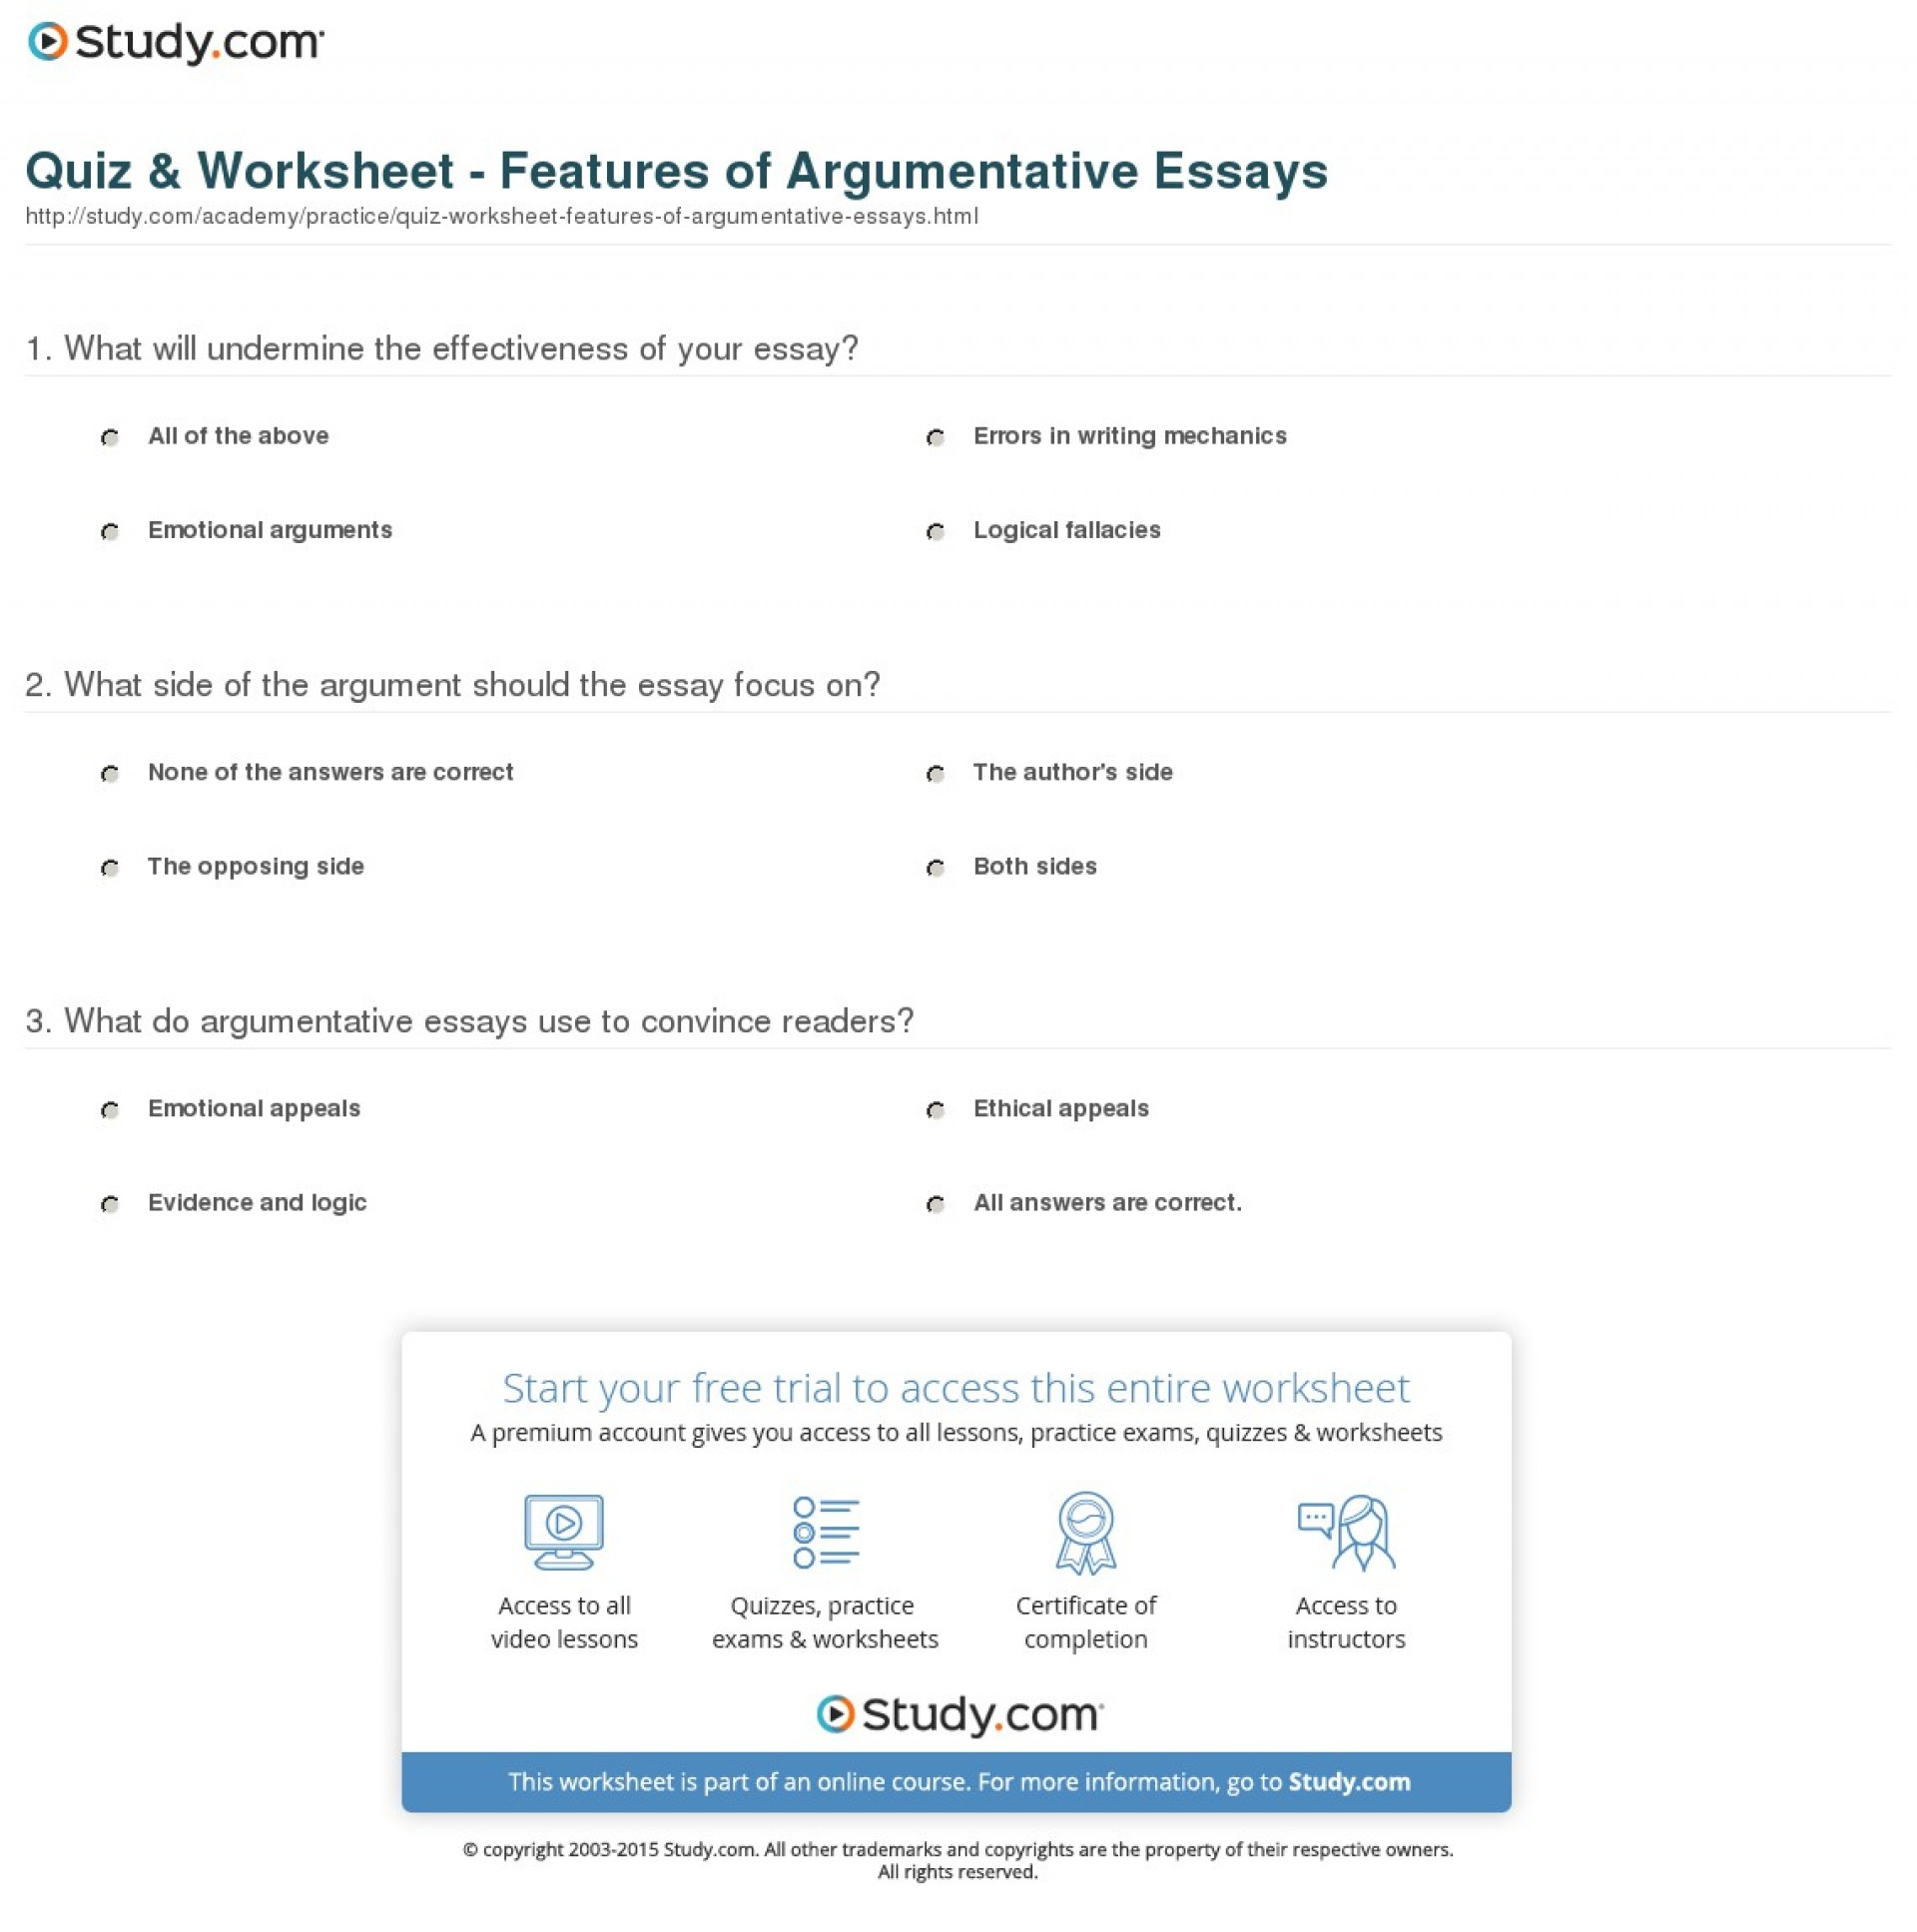 013 Argumentative Essay Structure Quiz Worksheet Features Of Essays Imposing Ppt Pdf Outline 1920